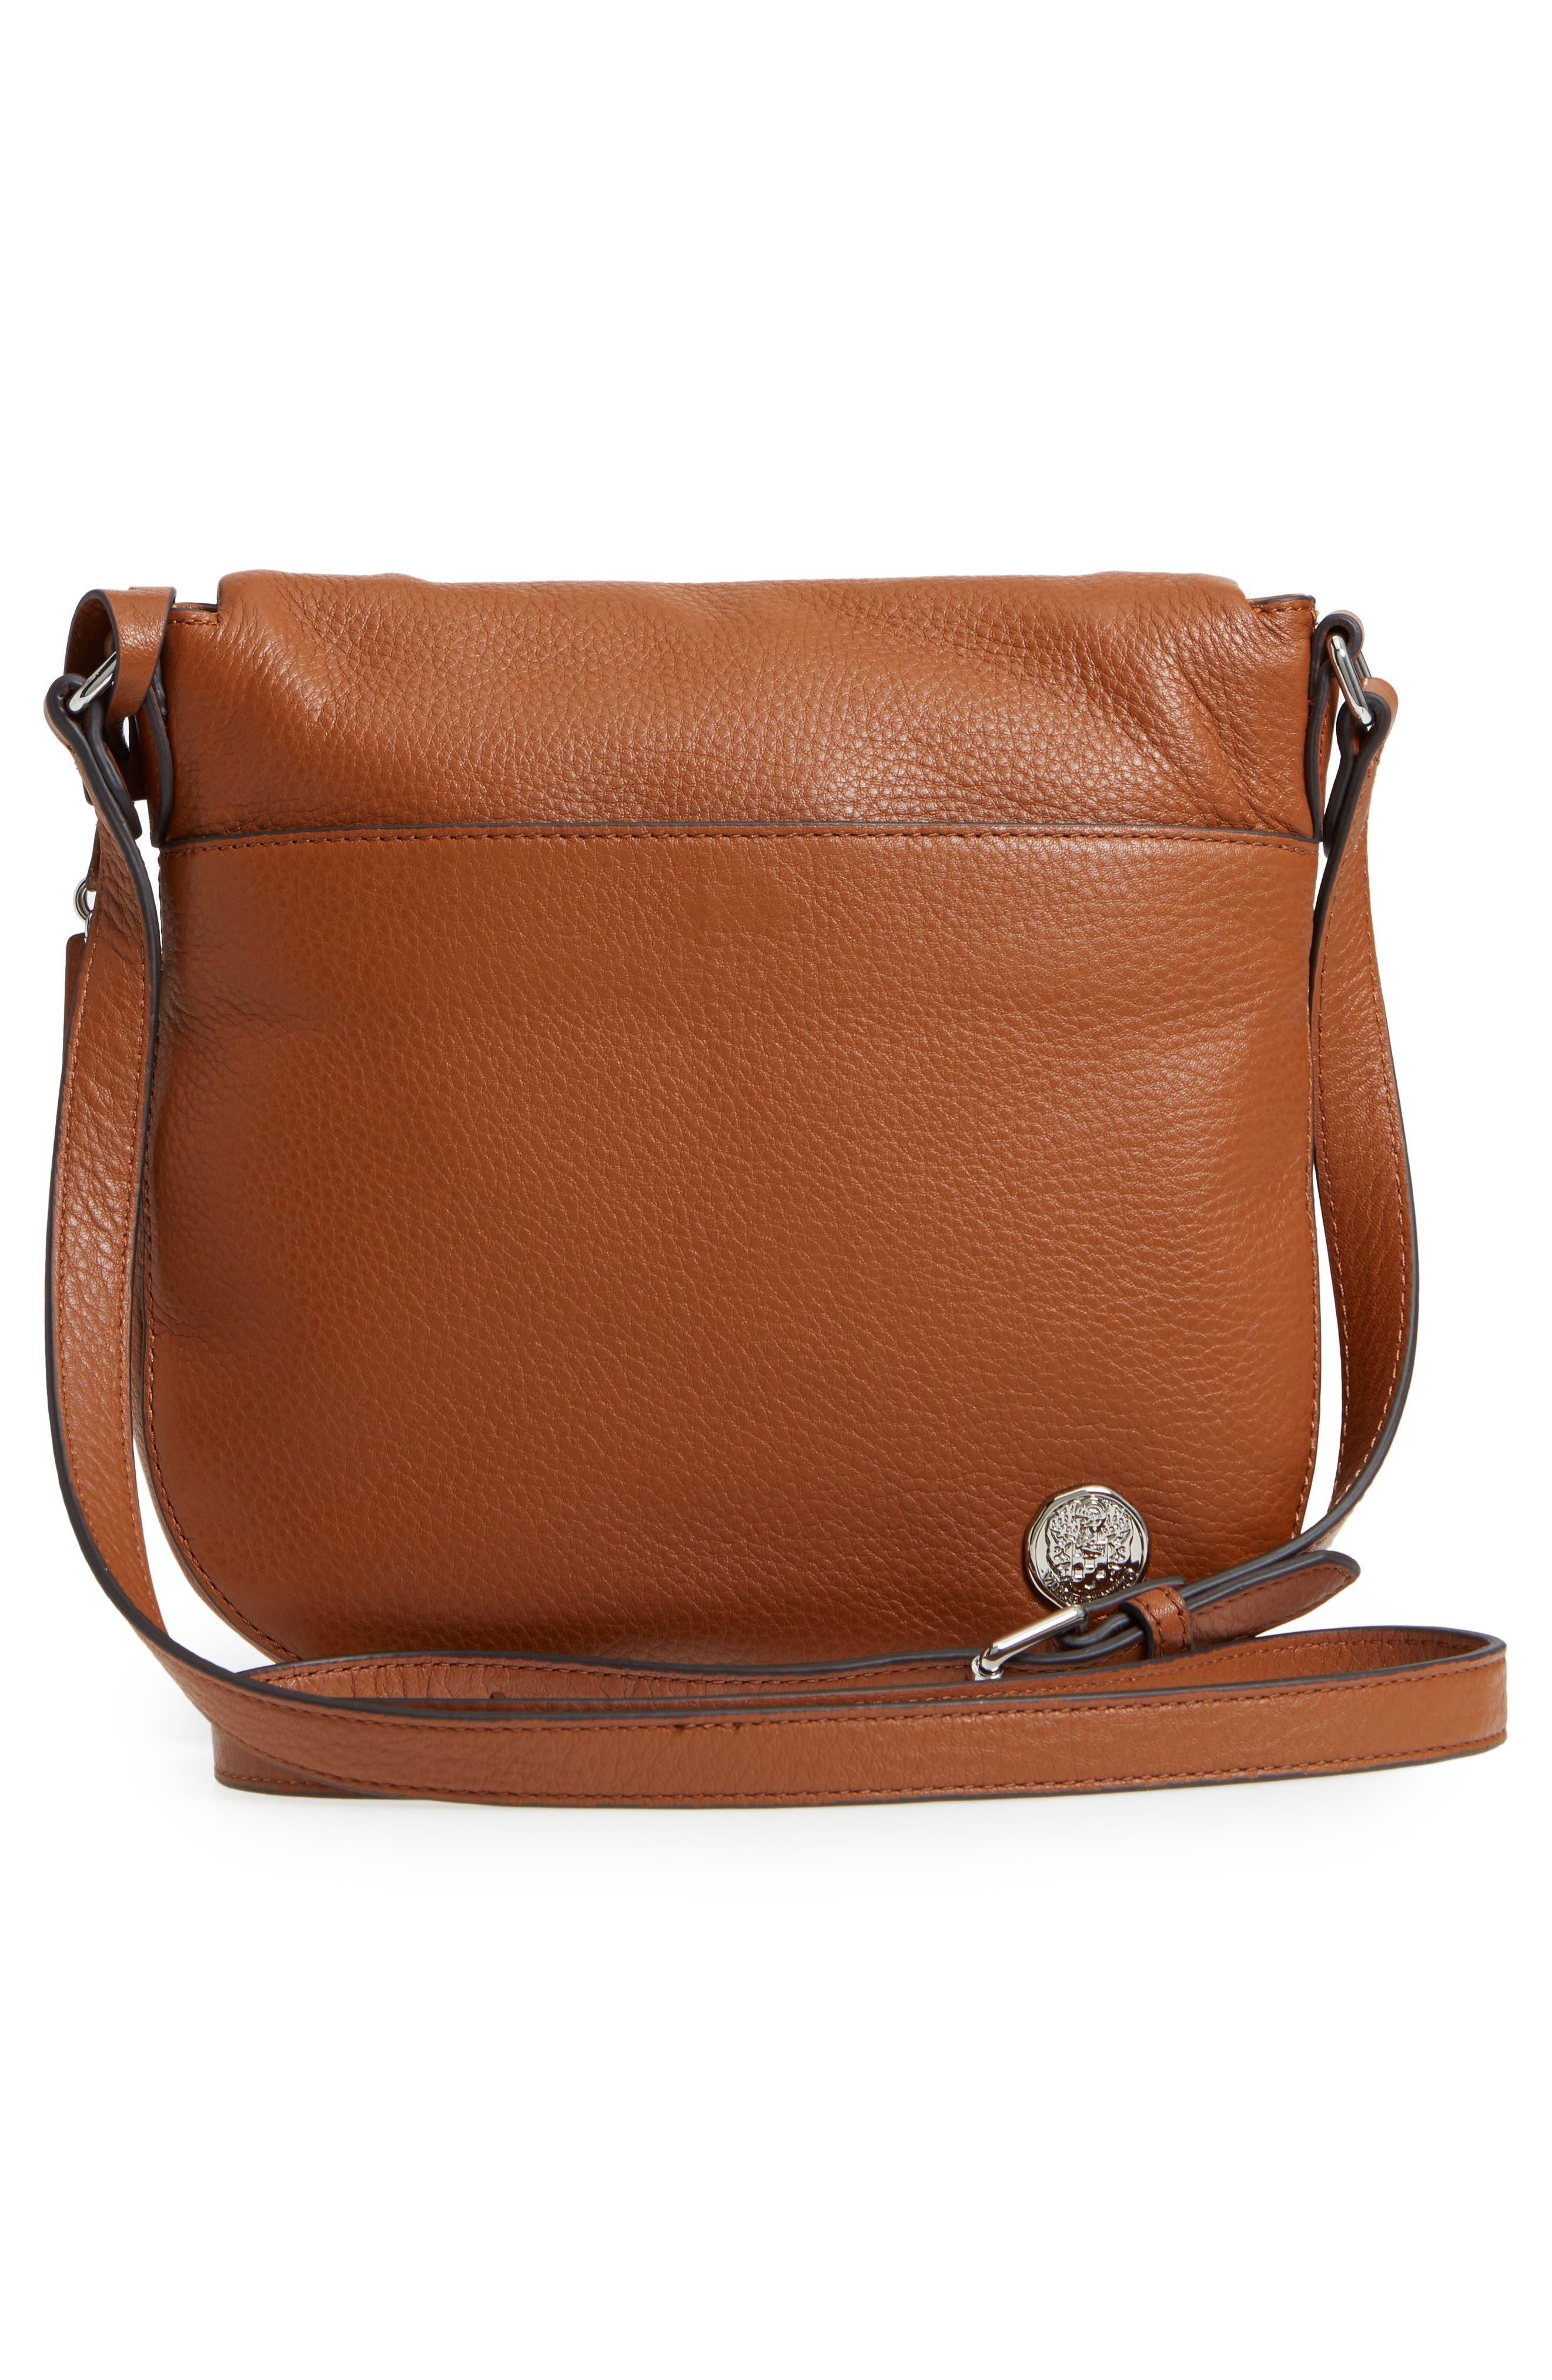 'Tala' Leather Crossbody Bag,                             Alternate thumbnail 3, color,                             Dark Rum